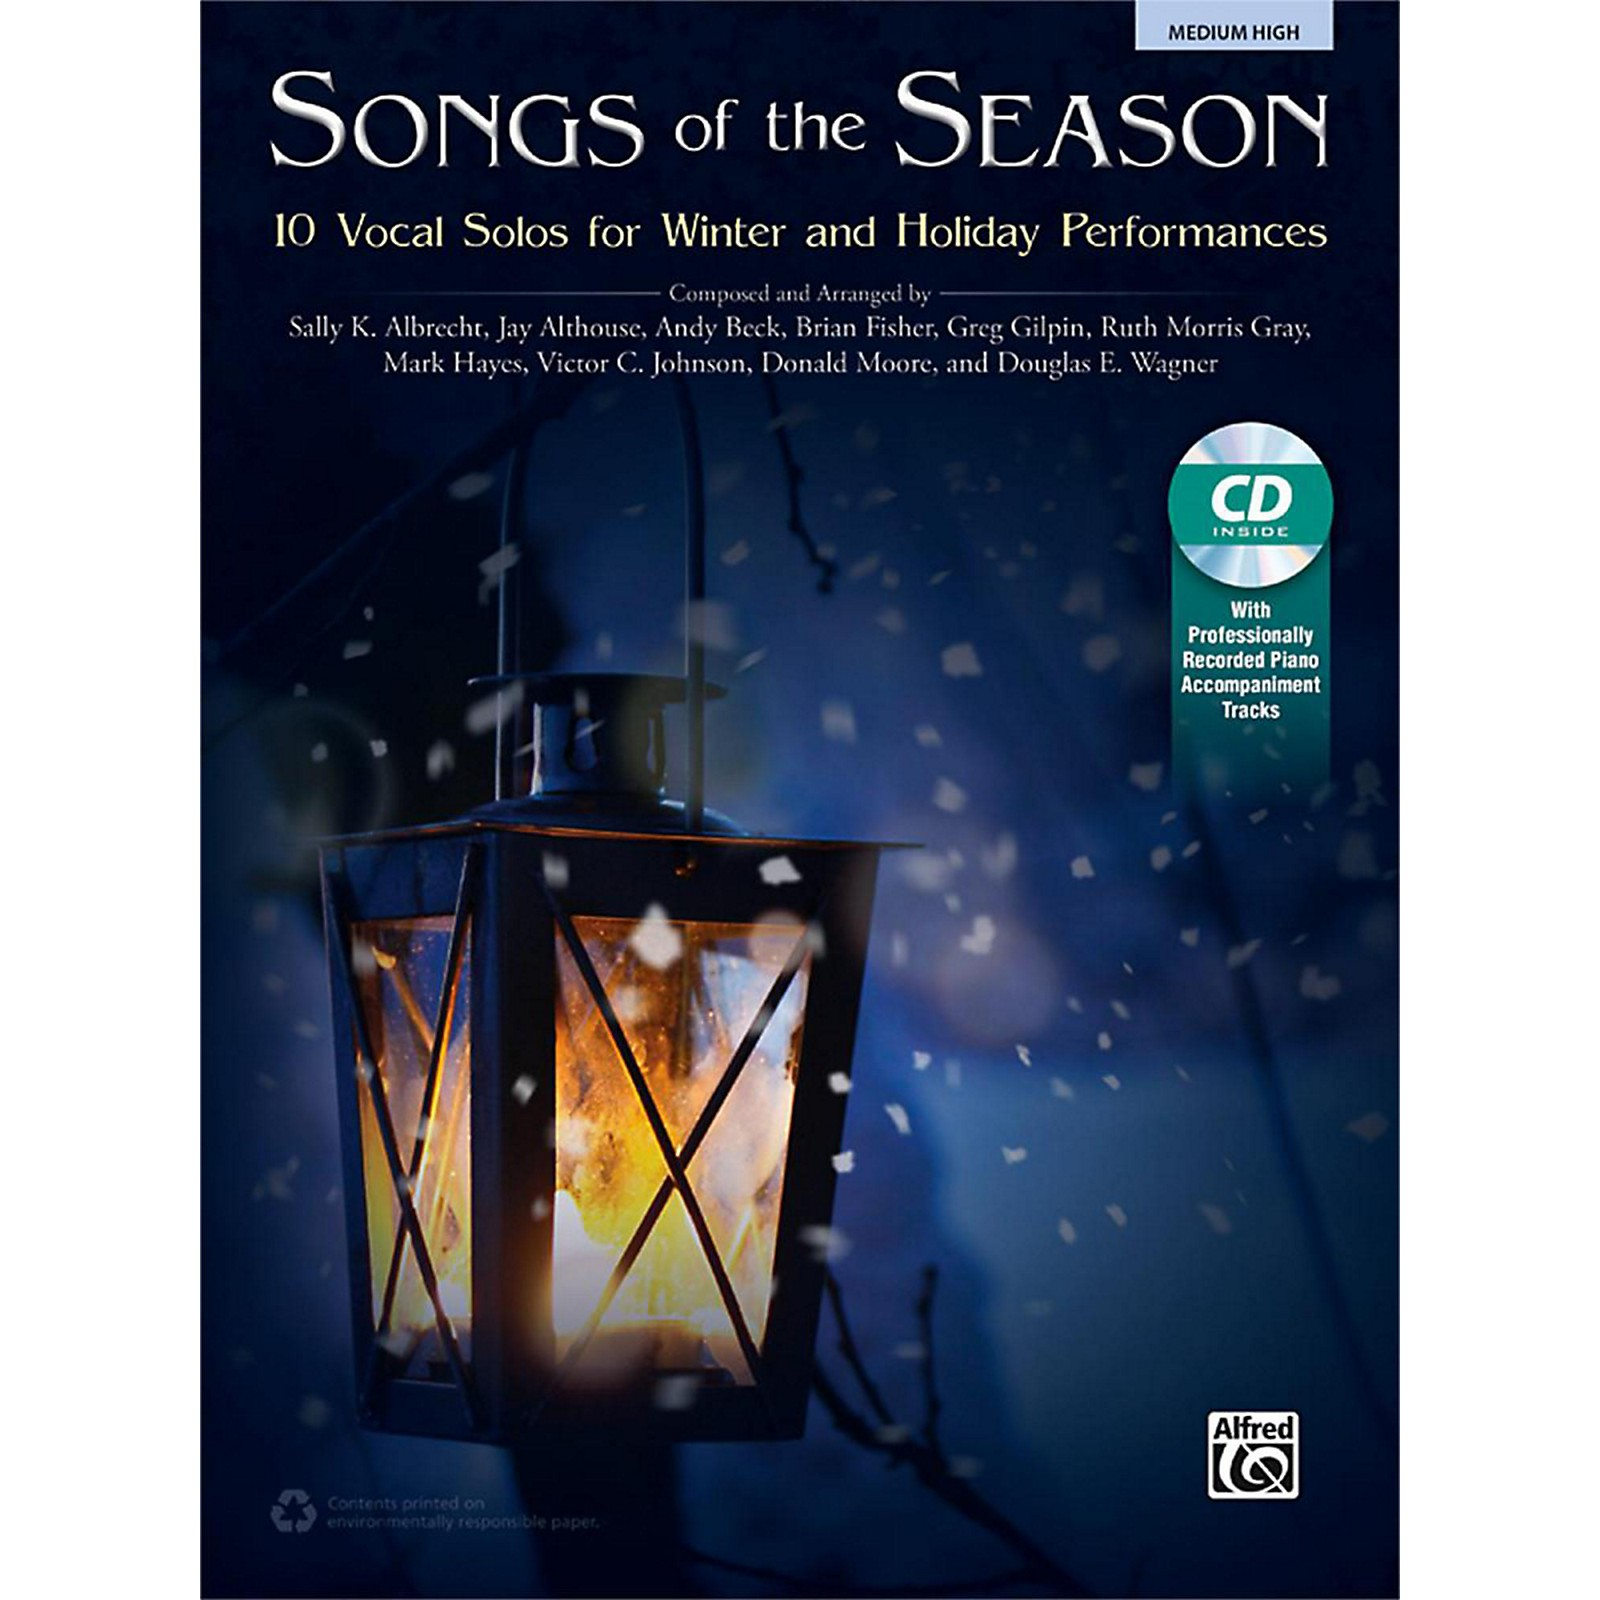 Alfred Songs of the Season Medium High Book & Acc. CD